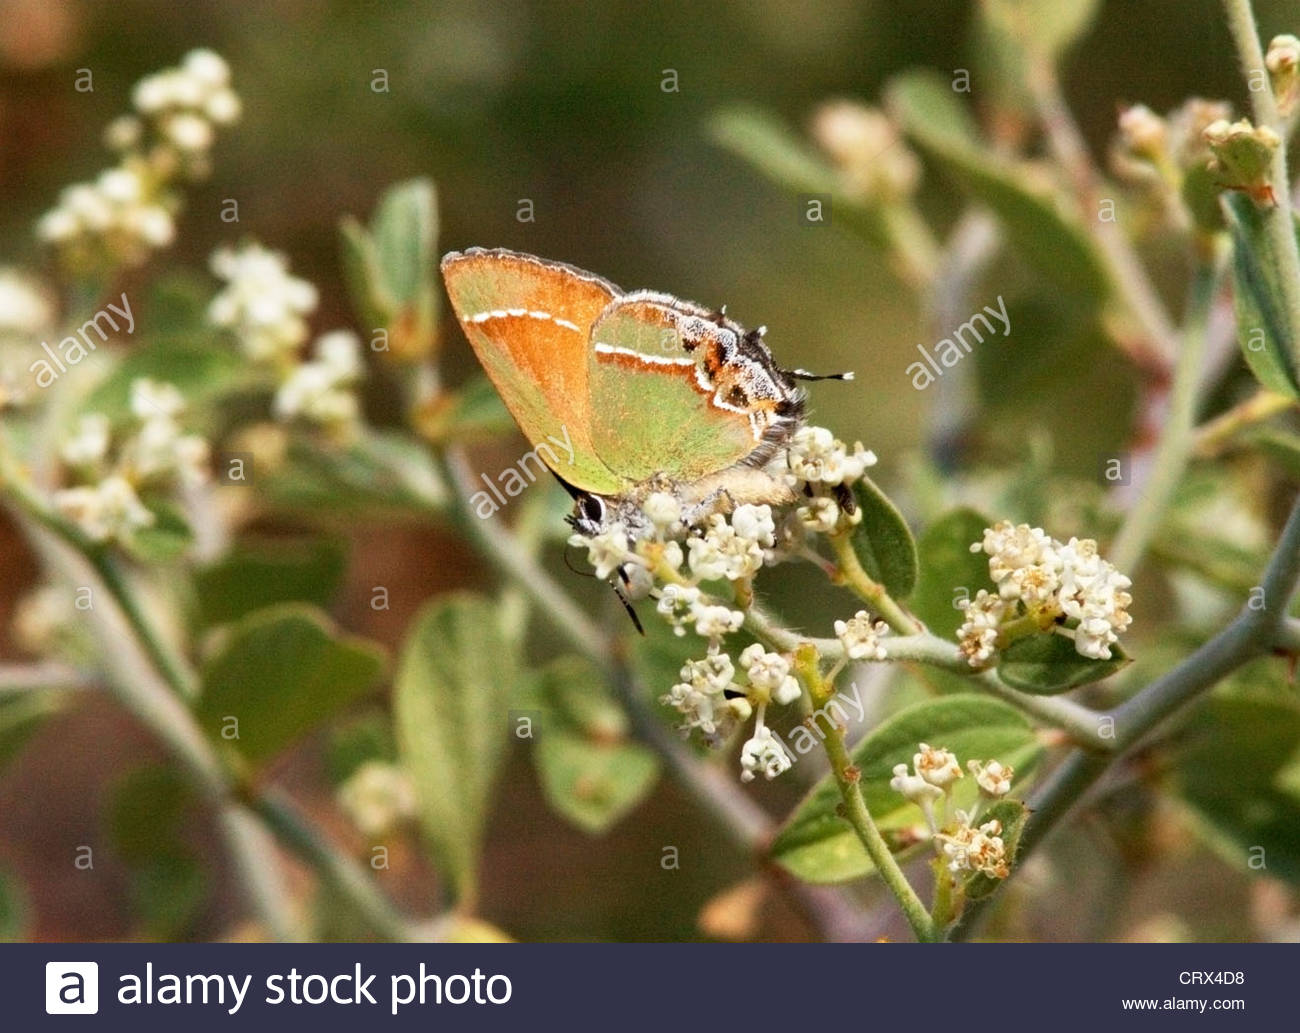 Siva Juniper Hairstreak Callophrys gryneus Mitoura gryneus siva Butterfly Arizona Foto de stock